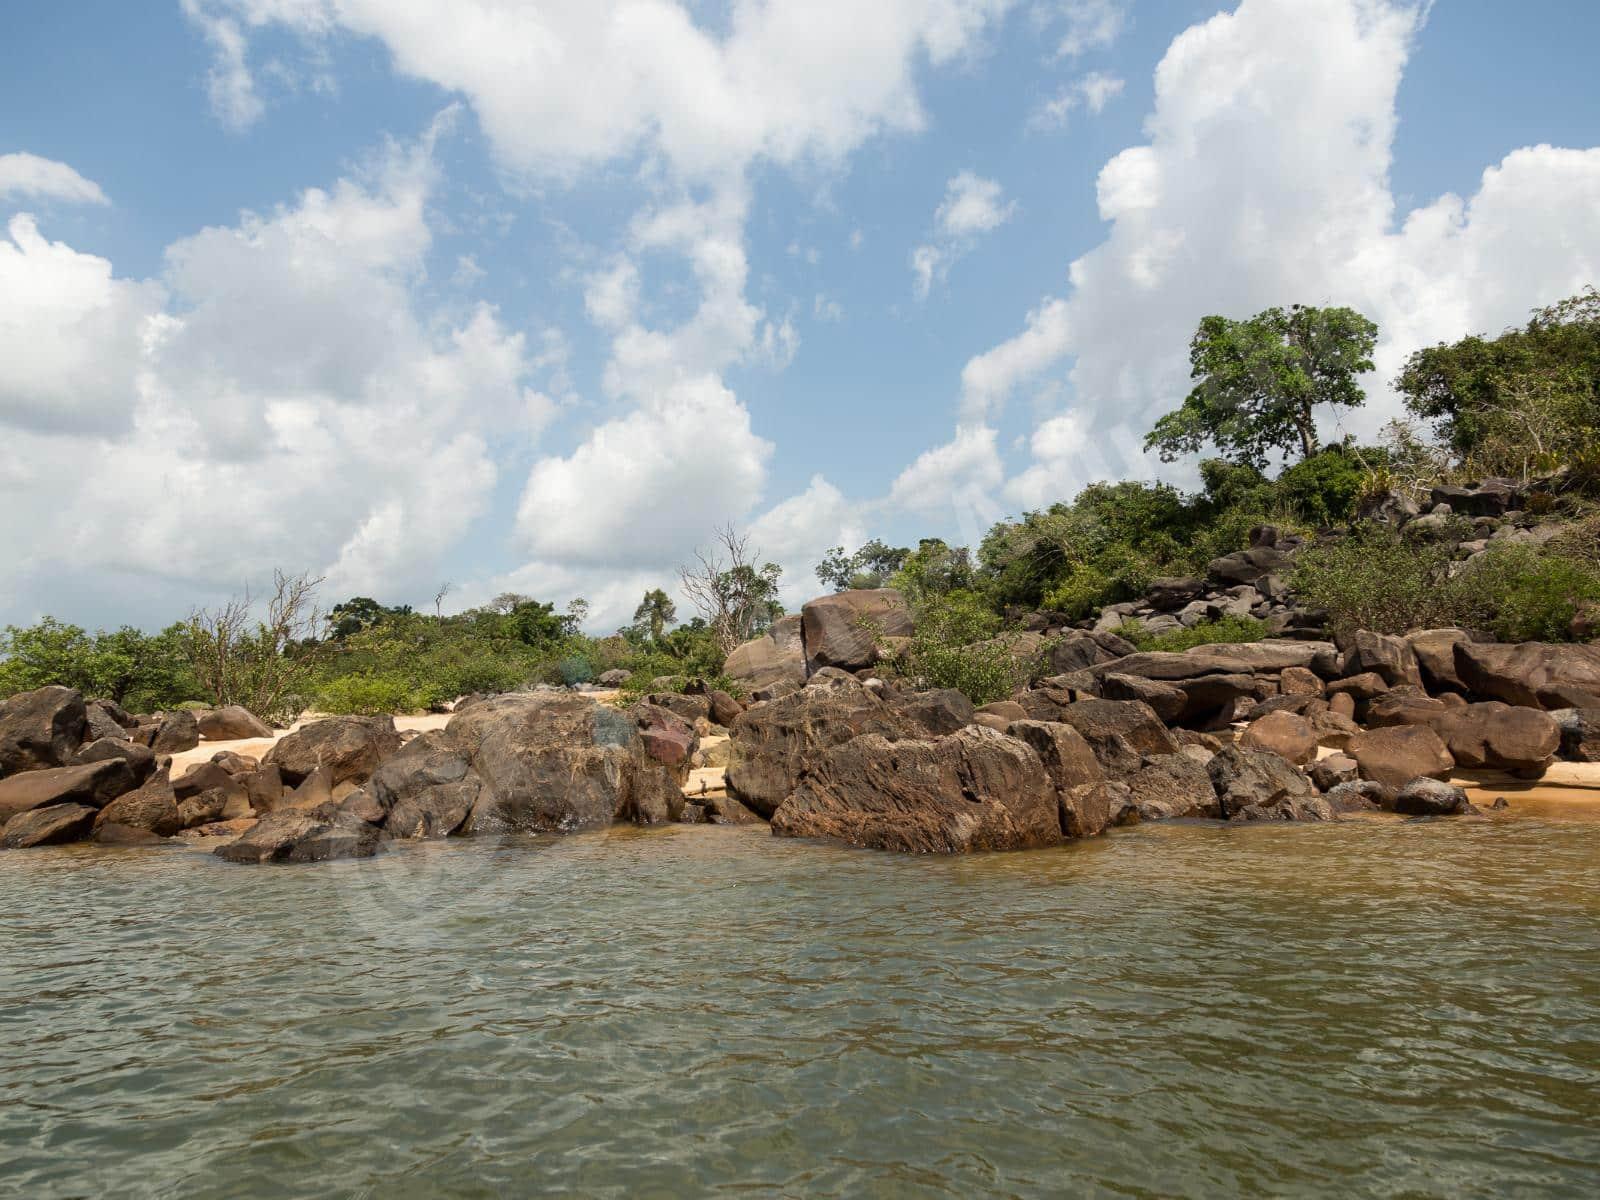 rio xingu  cachoeira do tapaiunas  andreas tanke 0057 6